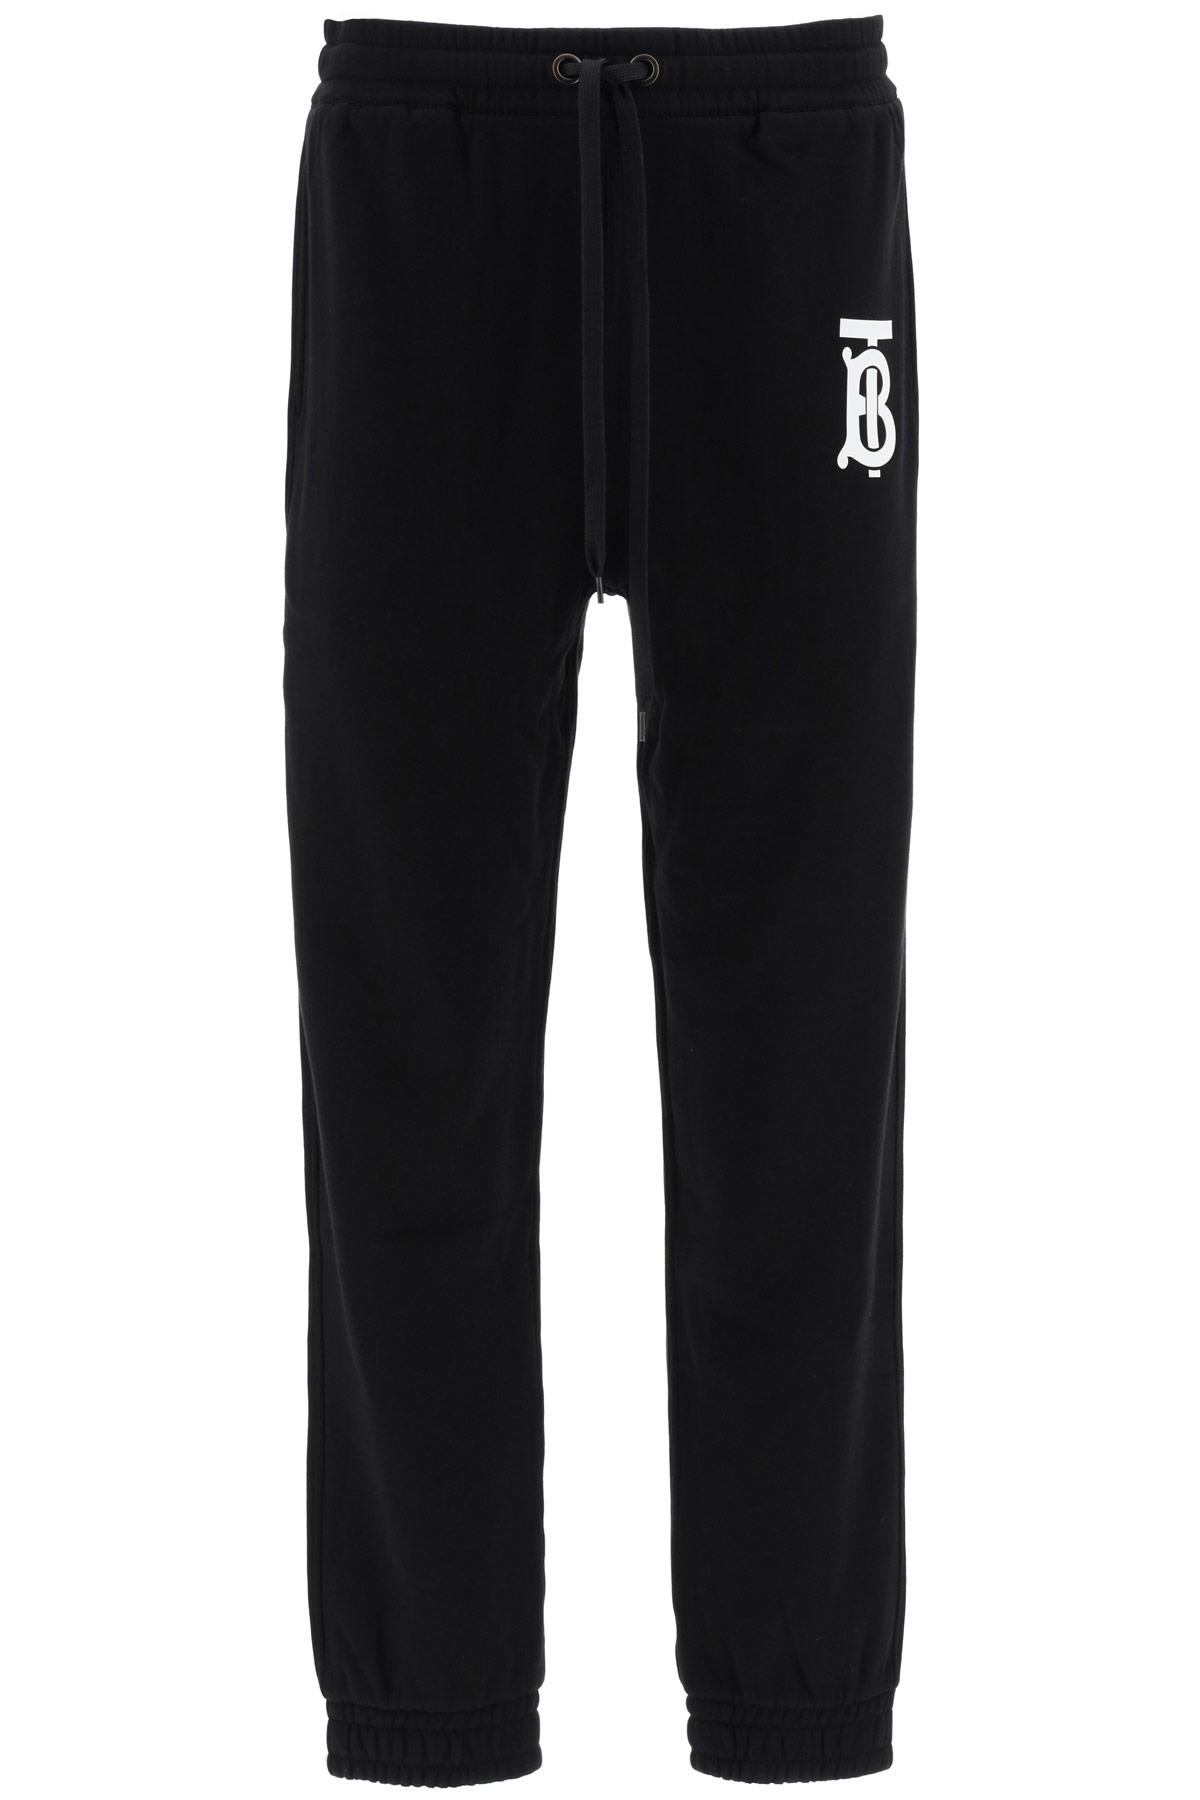 Burberry gresham jogger pants